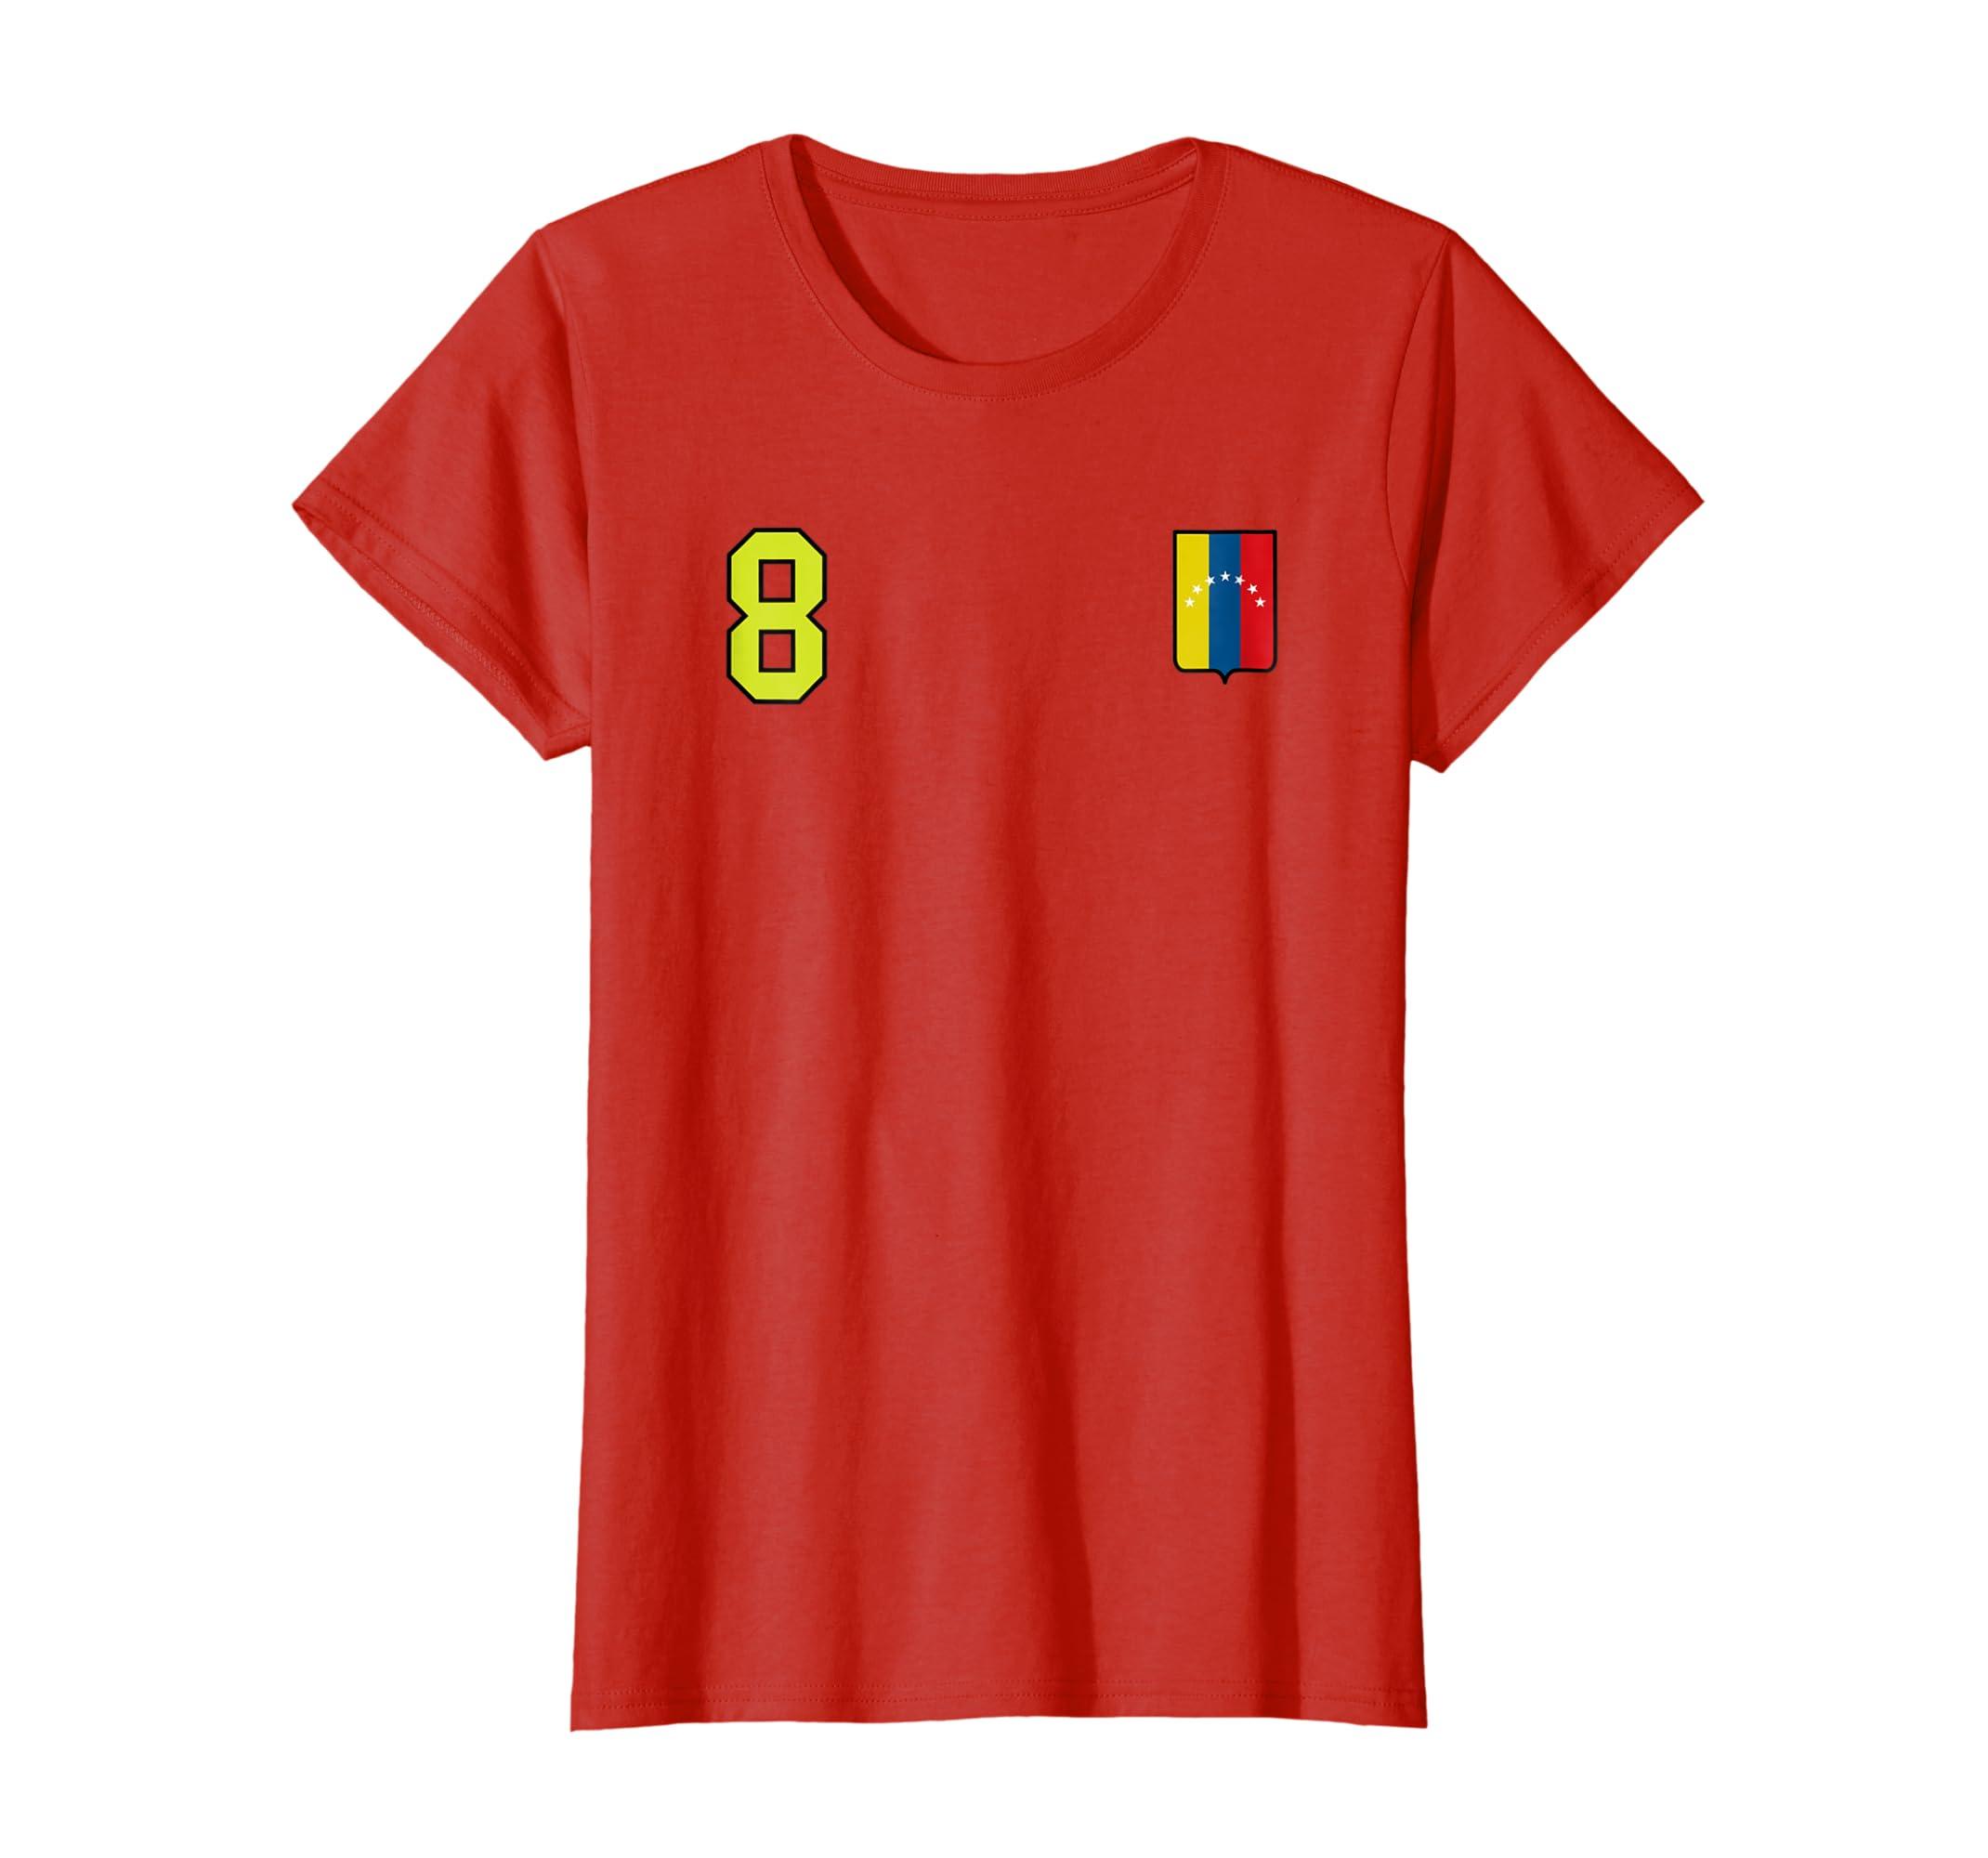 Amazon.com: Venezuela Soccer T-Shirt Camiseta Vinotinto Futbol Retro 8: Clothing